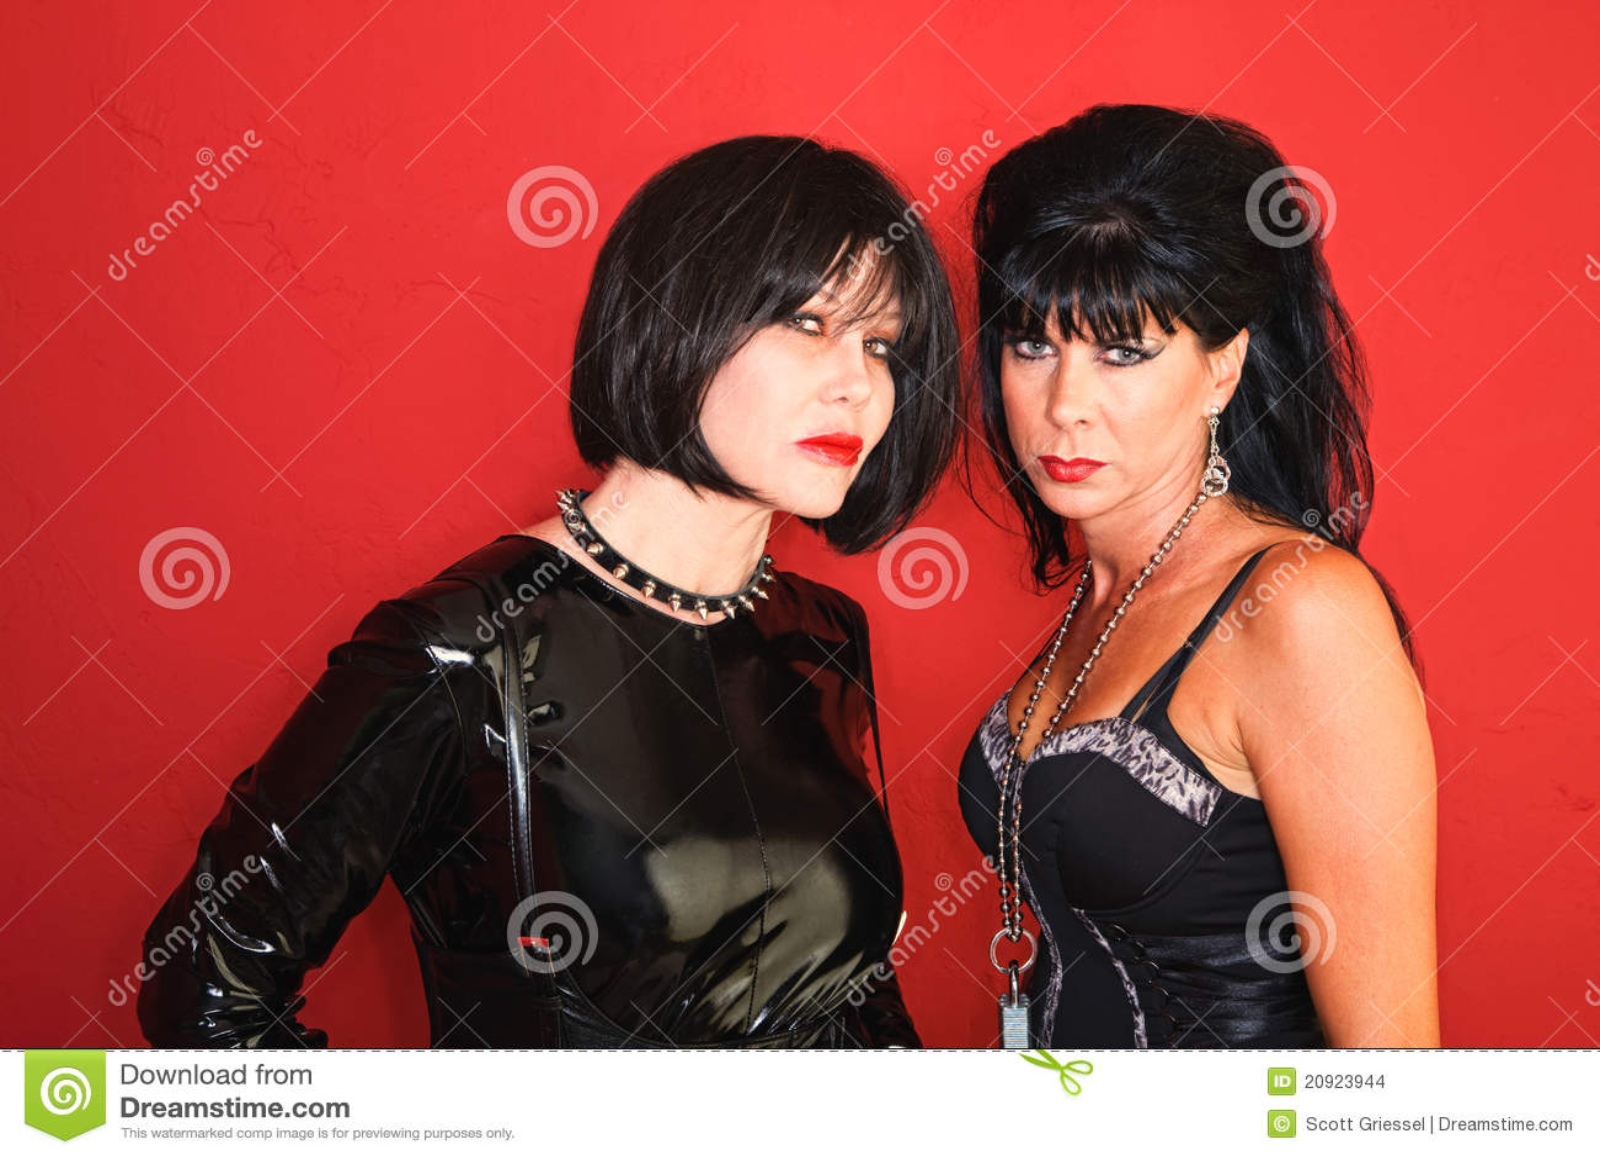 Two Dominatrix Women